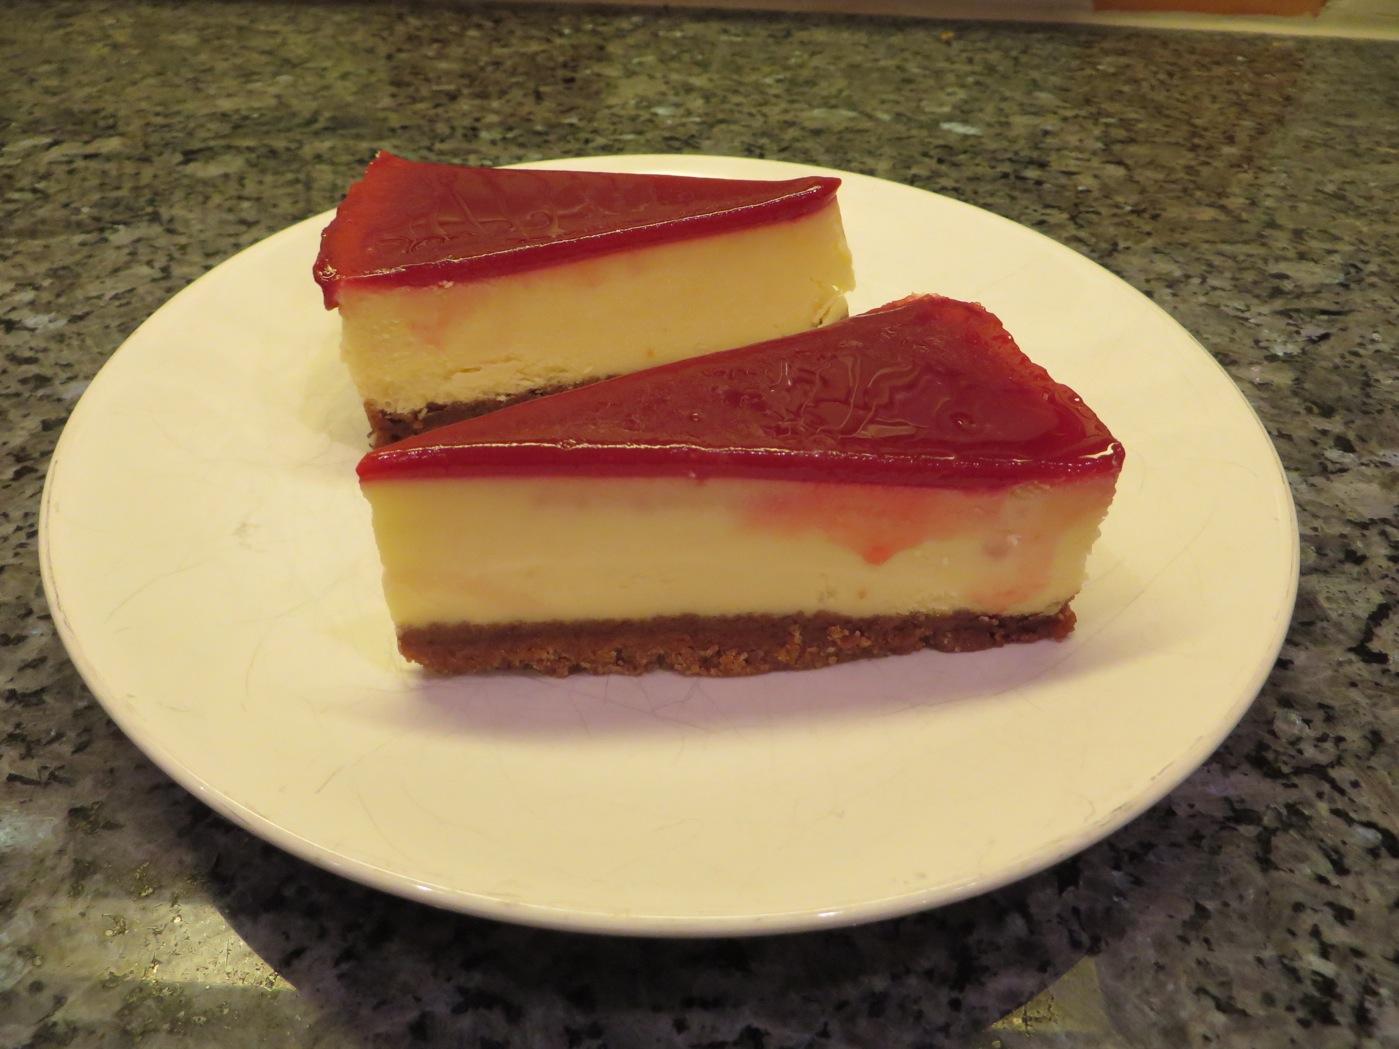 Cheesecake från Senoble